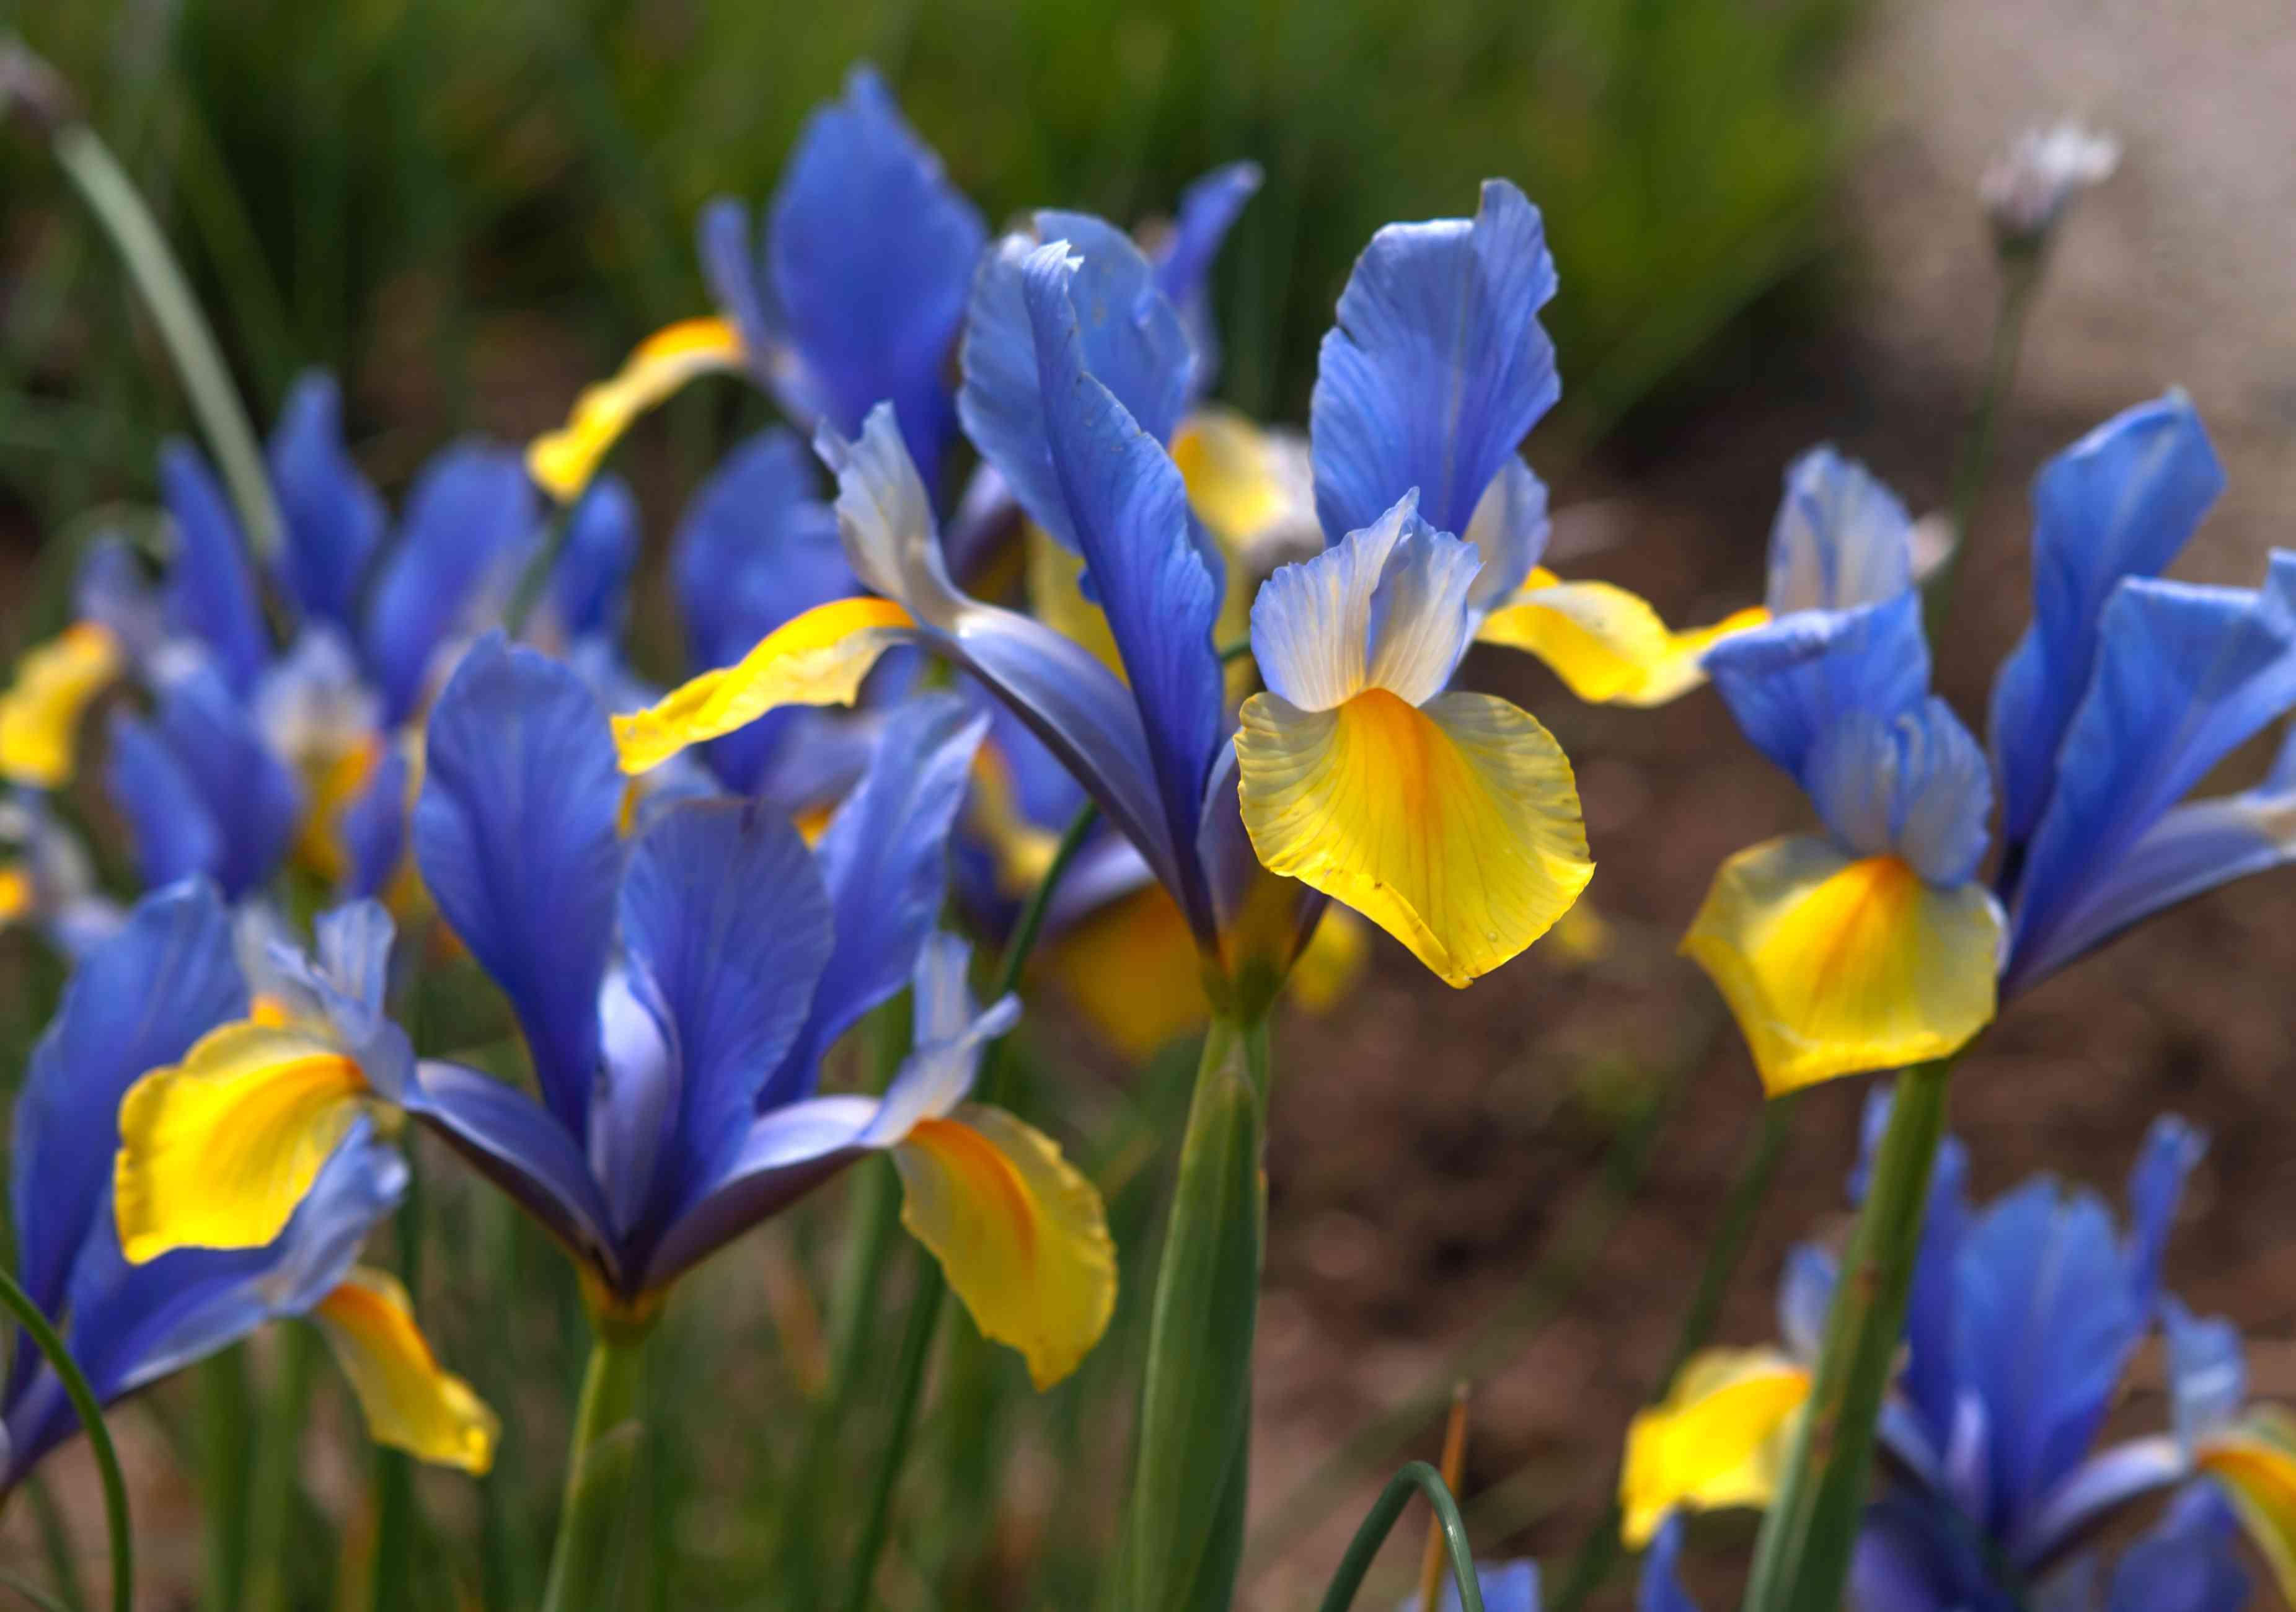 Dutch iris romano with blue and yellow flowers